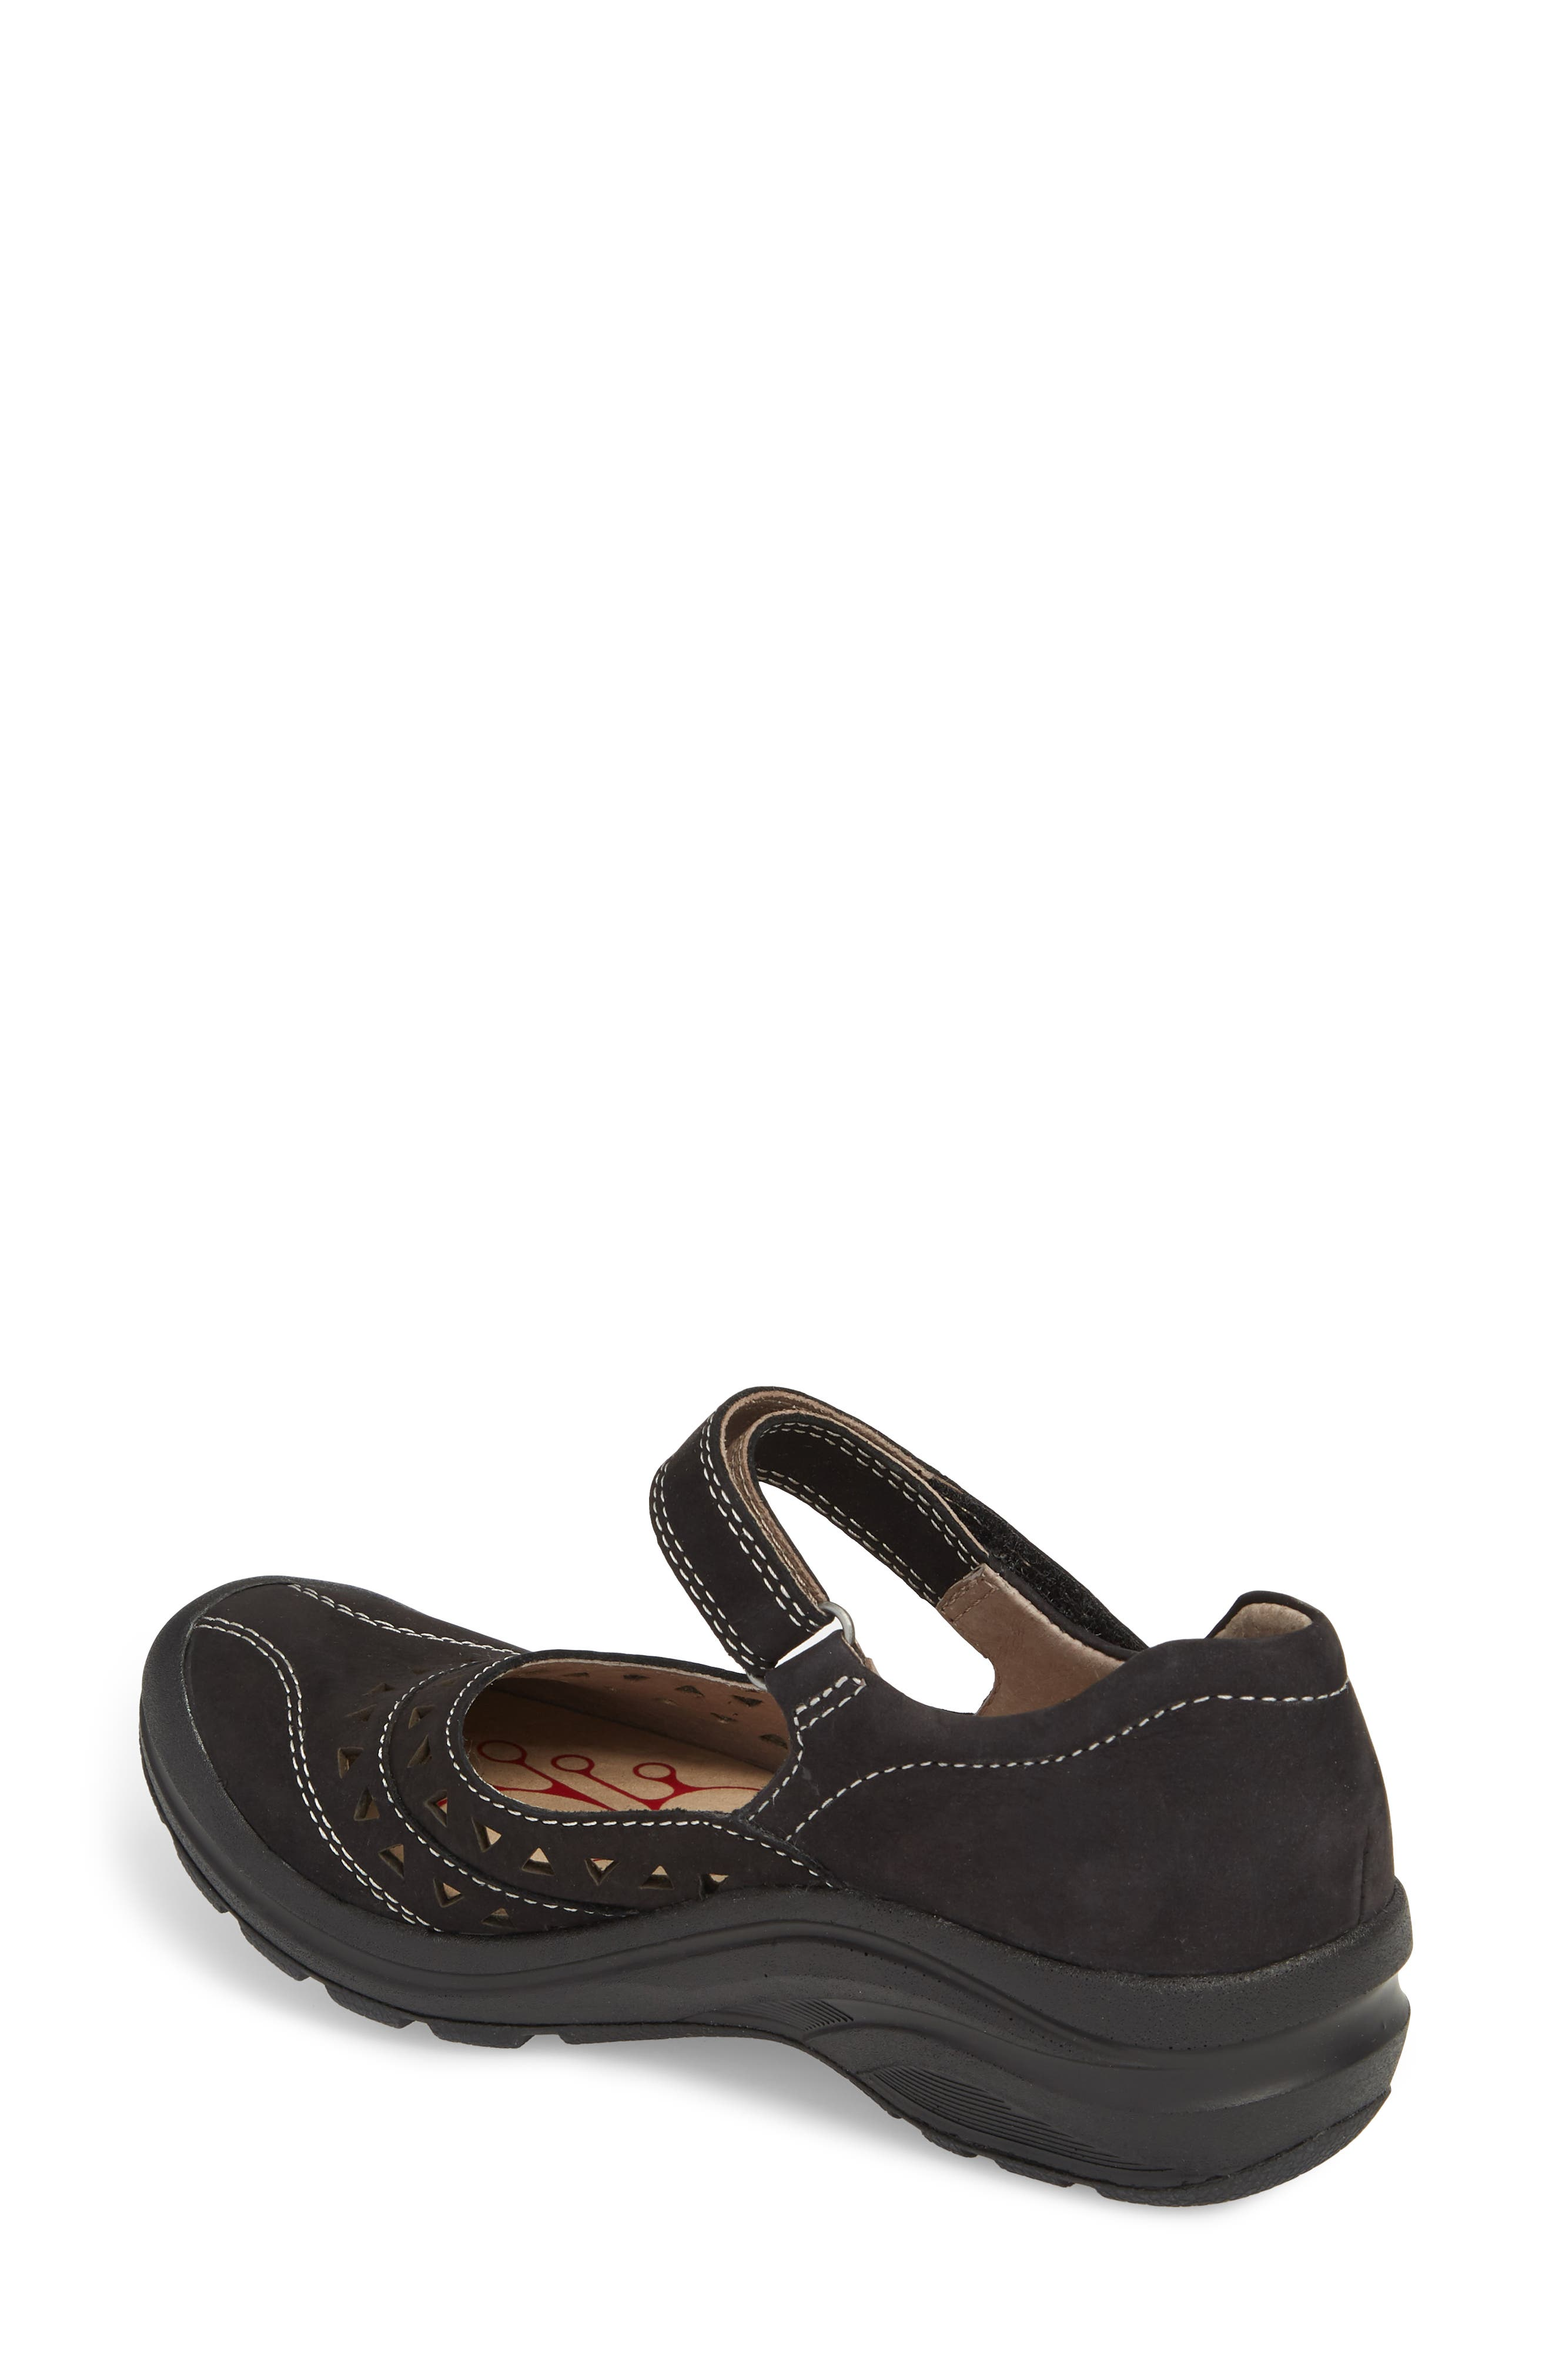 BIONICA,                             Matia Mary Jane Sneaker,                             Alternate thumbnail 2, color,                             BLACK LEATHER